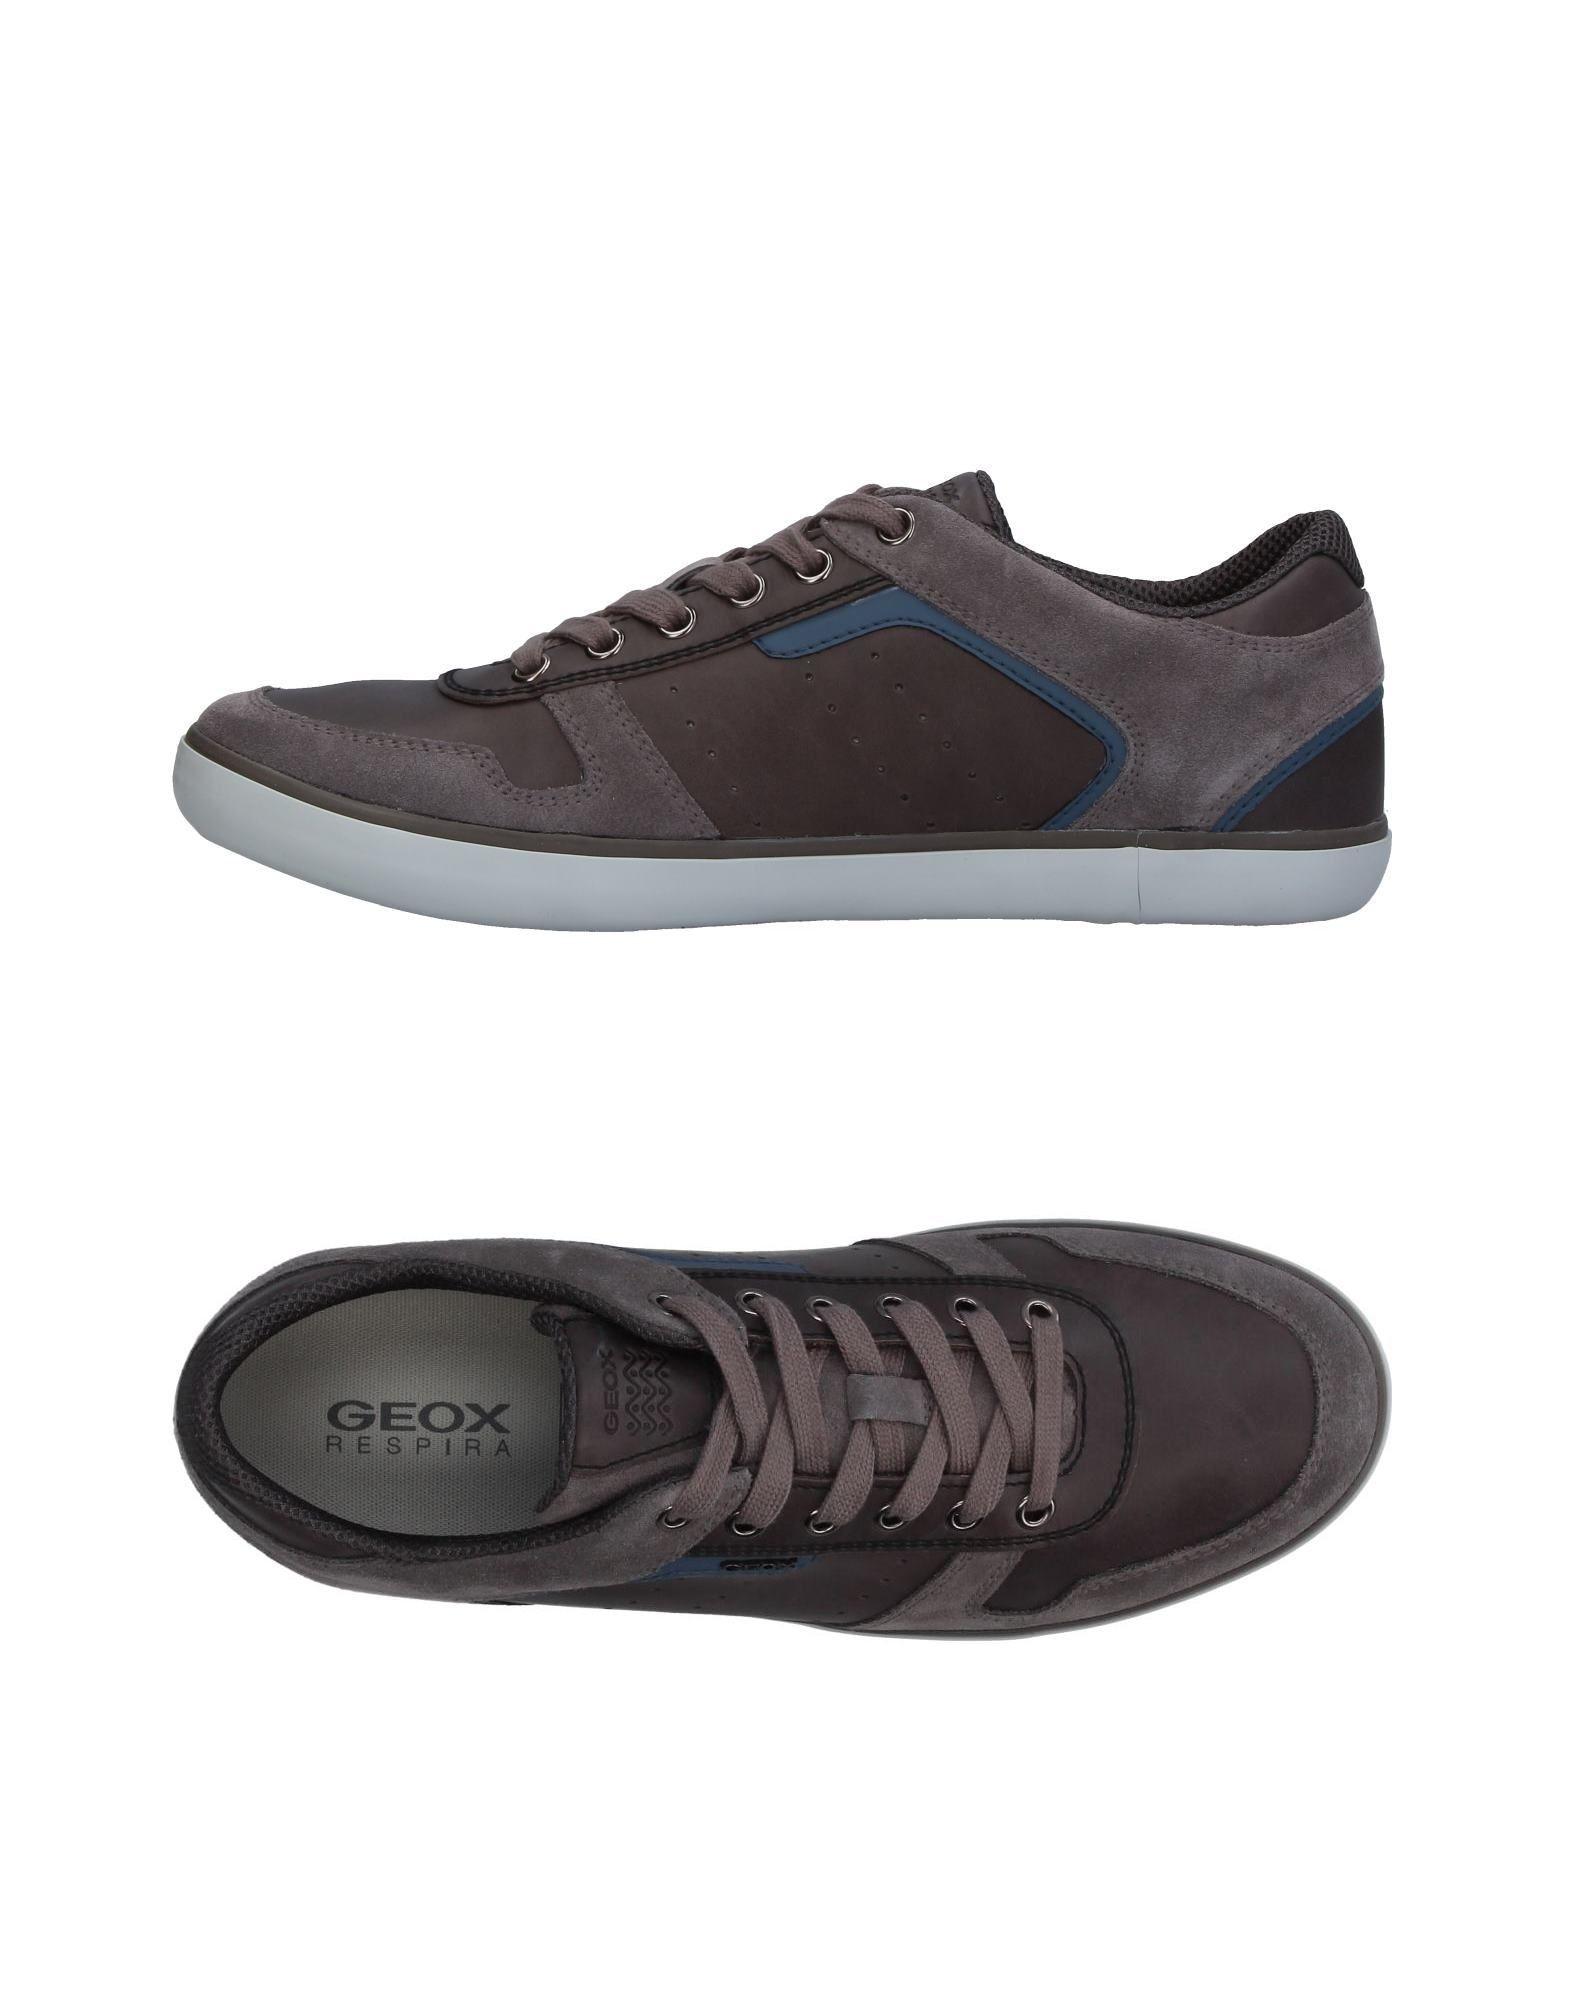 GEOX Herren Low Sneakers & Tennisschuhe Farbe Blei Größe 9 jetztbilligerkaufen